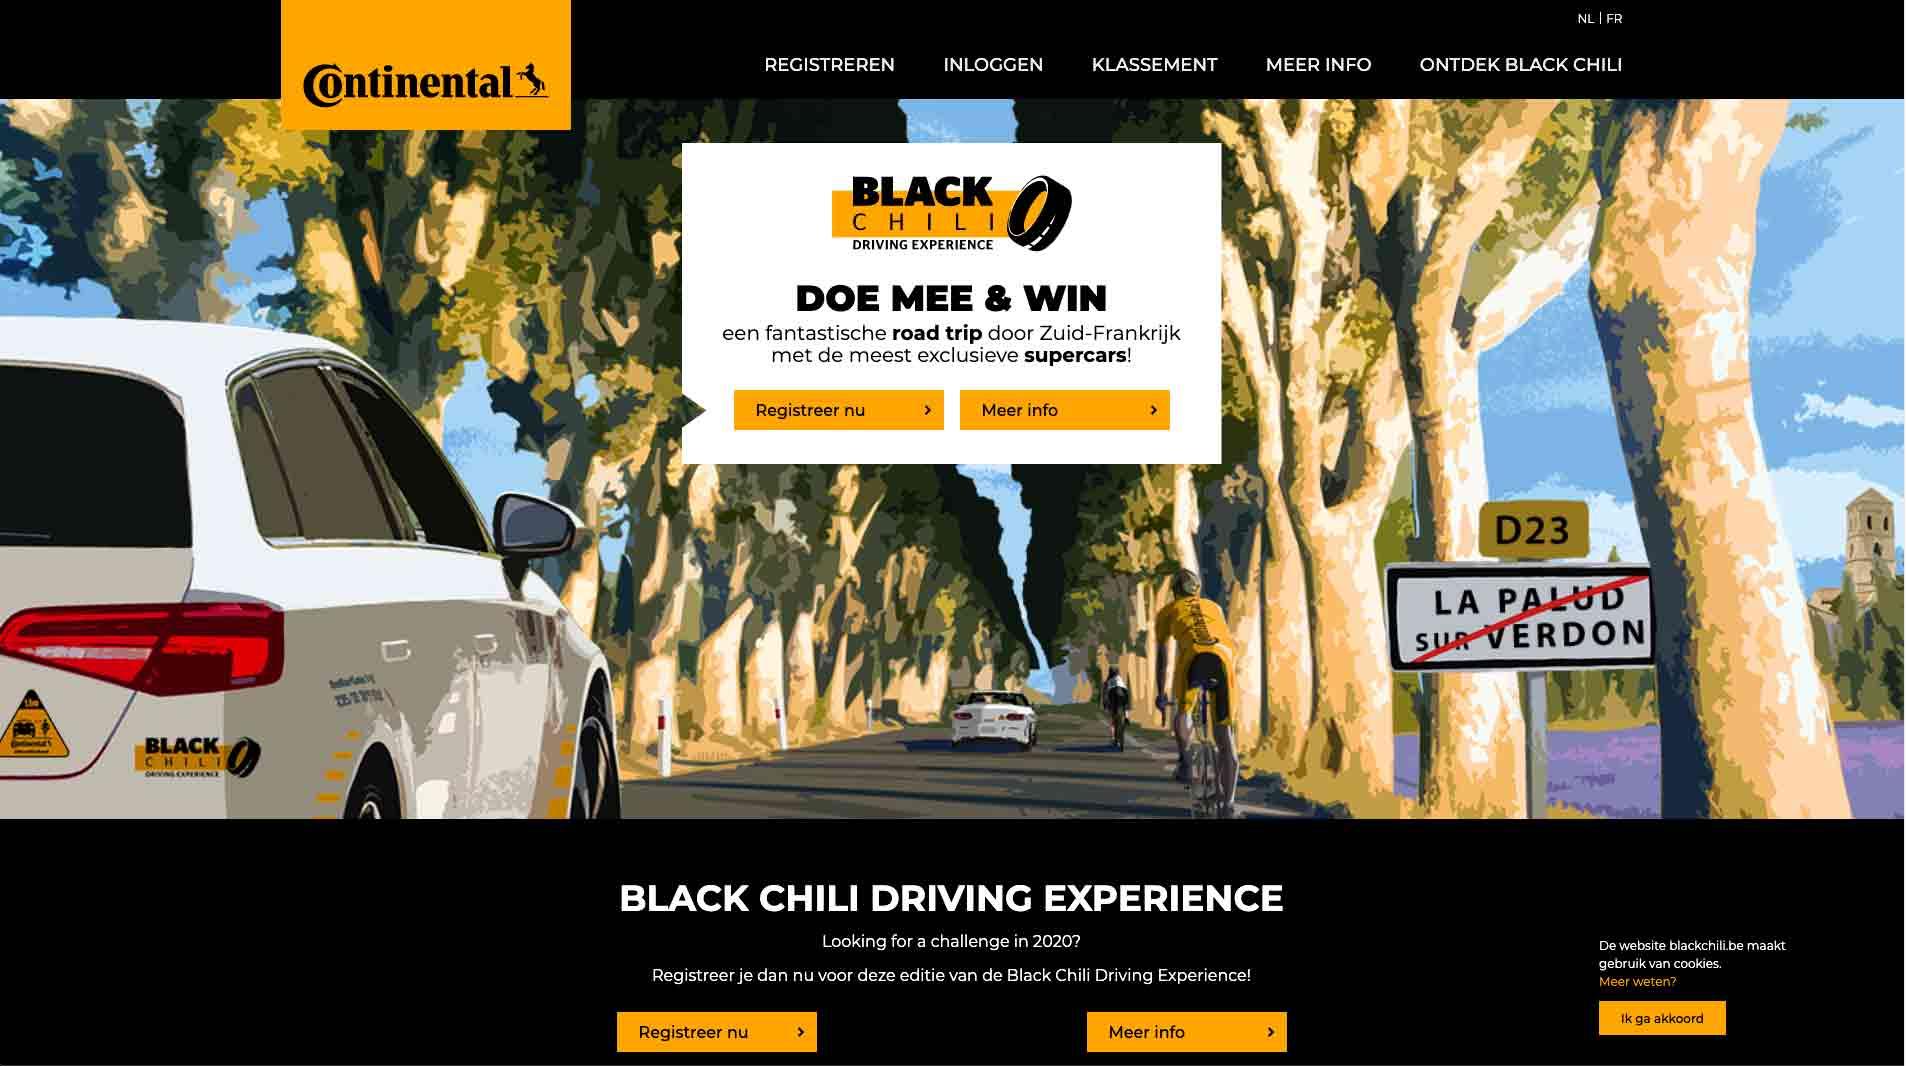 screenshot di www.blackchili.be/nl